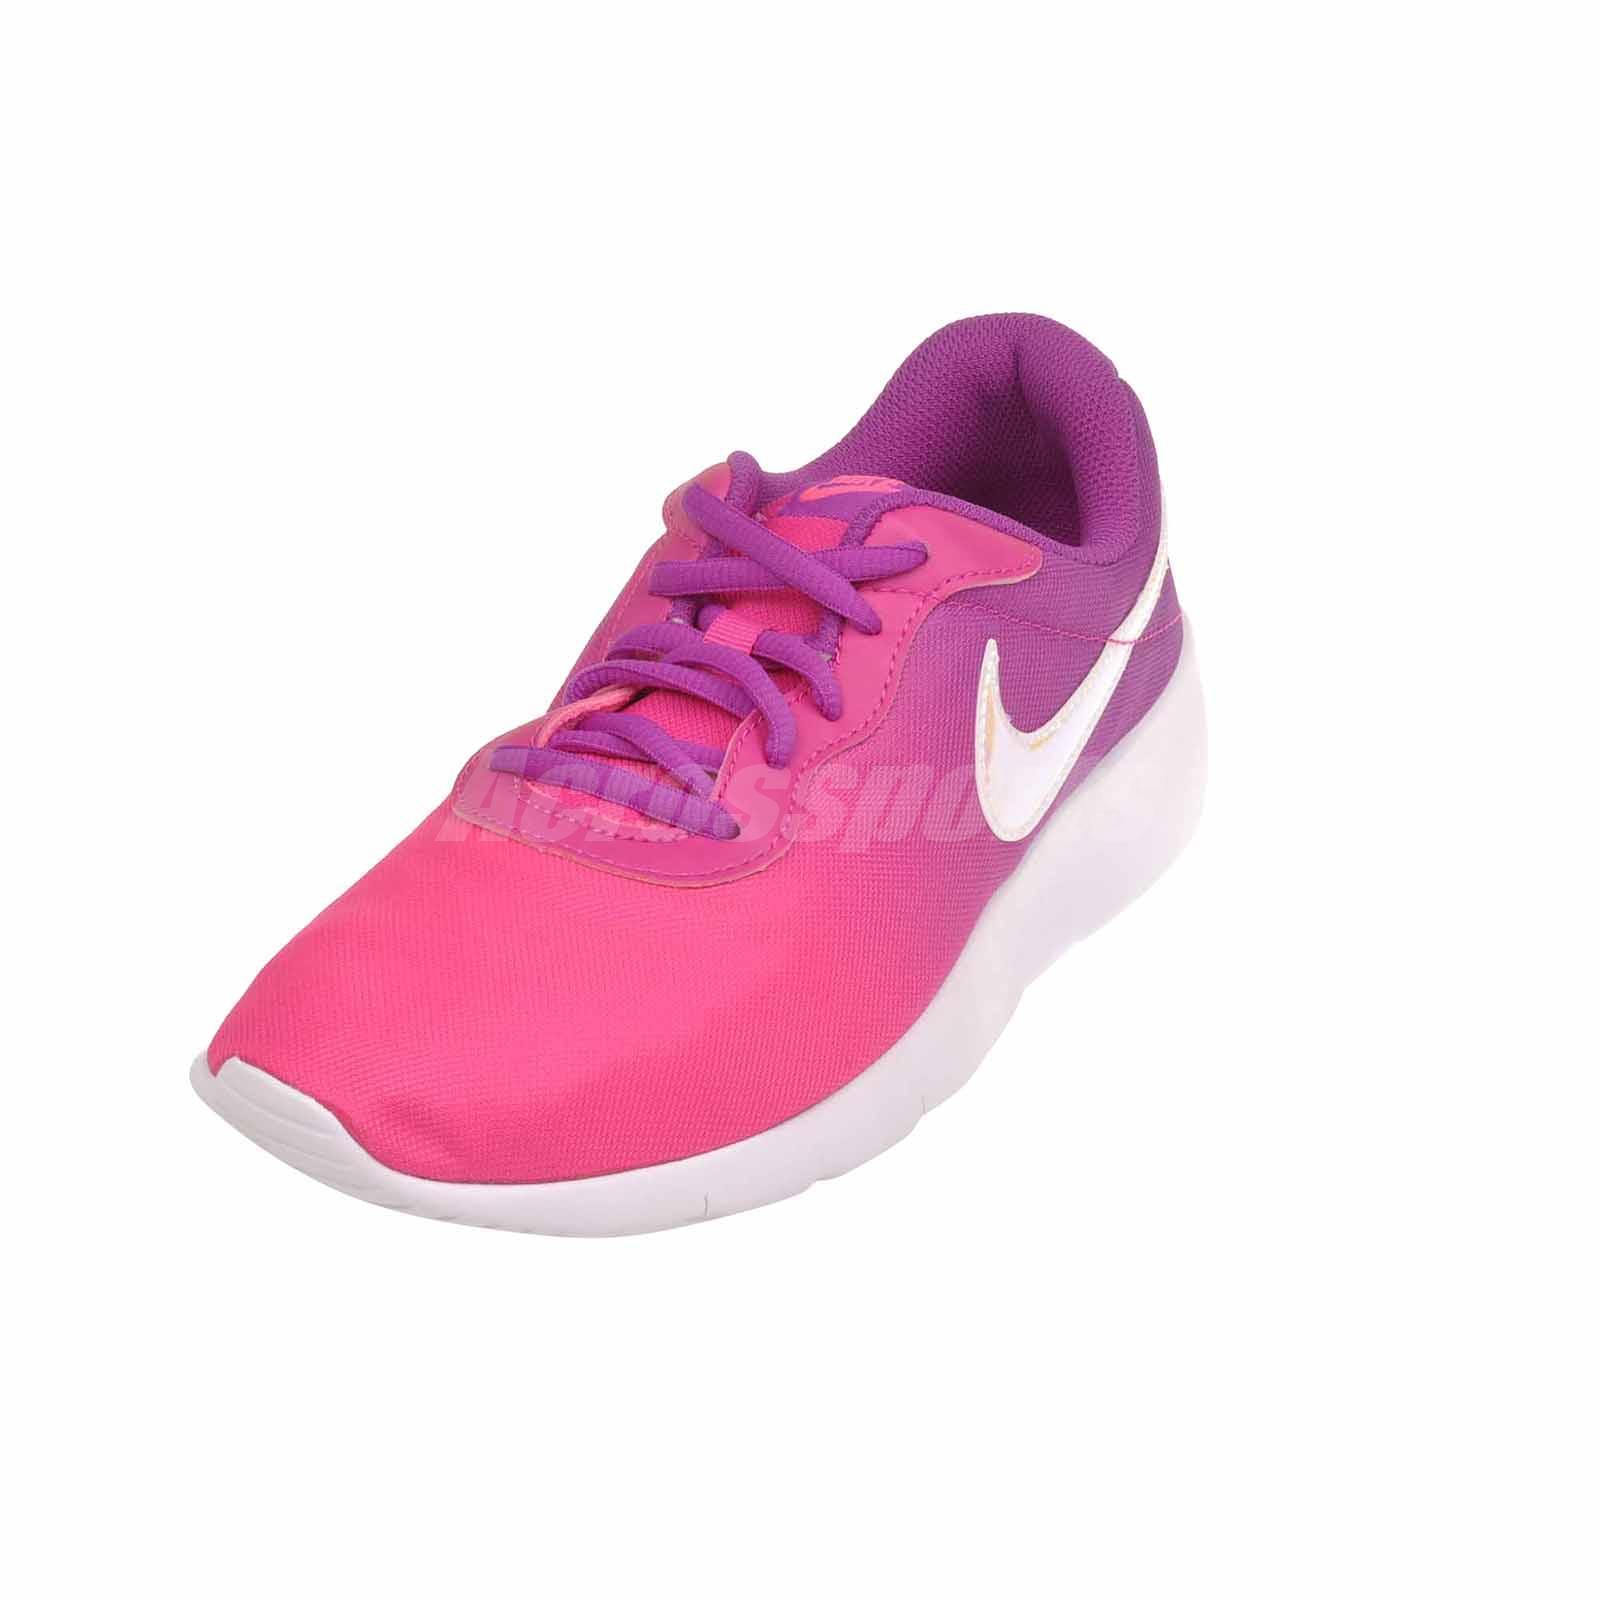 bomba lava Alaska  Nike impresión Tanjun (grade-school) Casual Zapatos Niños Jóvenes Hyper  Violeta AV8858-500 | eBay